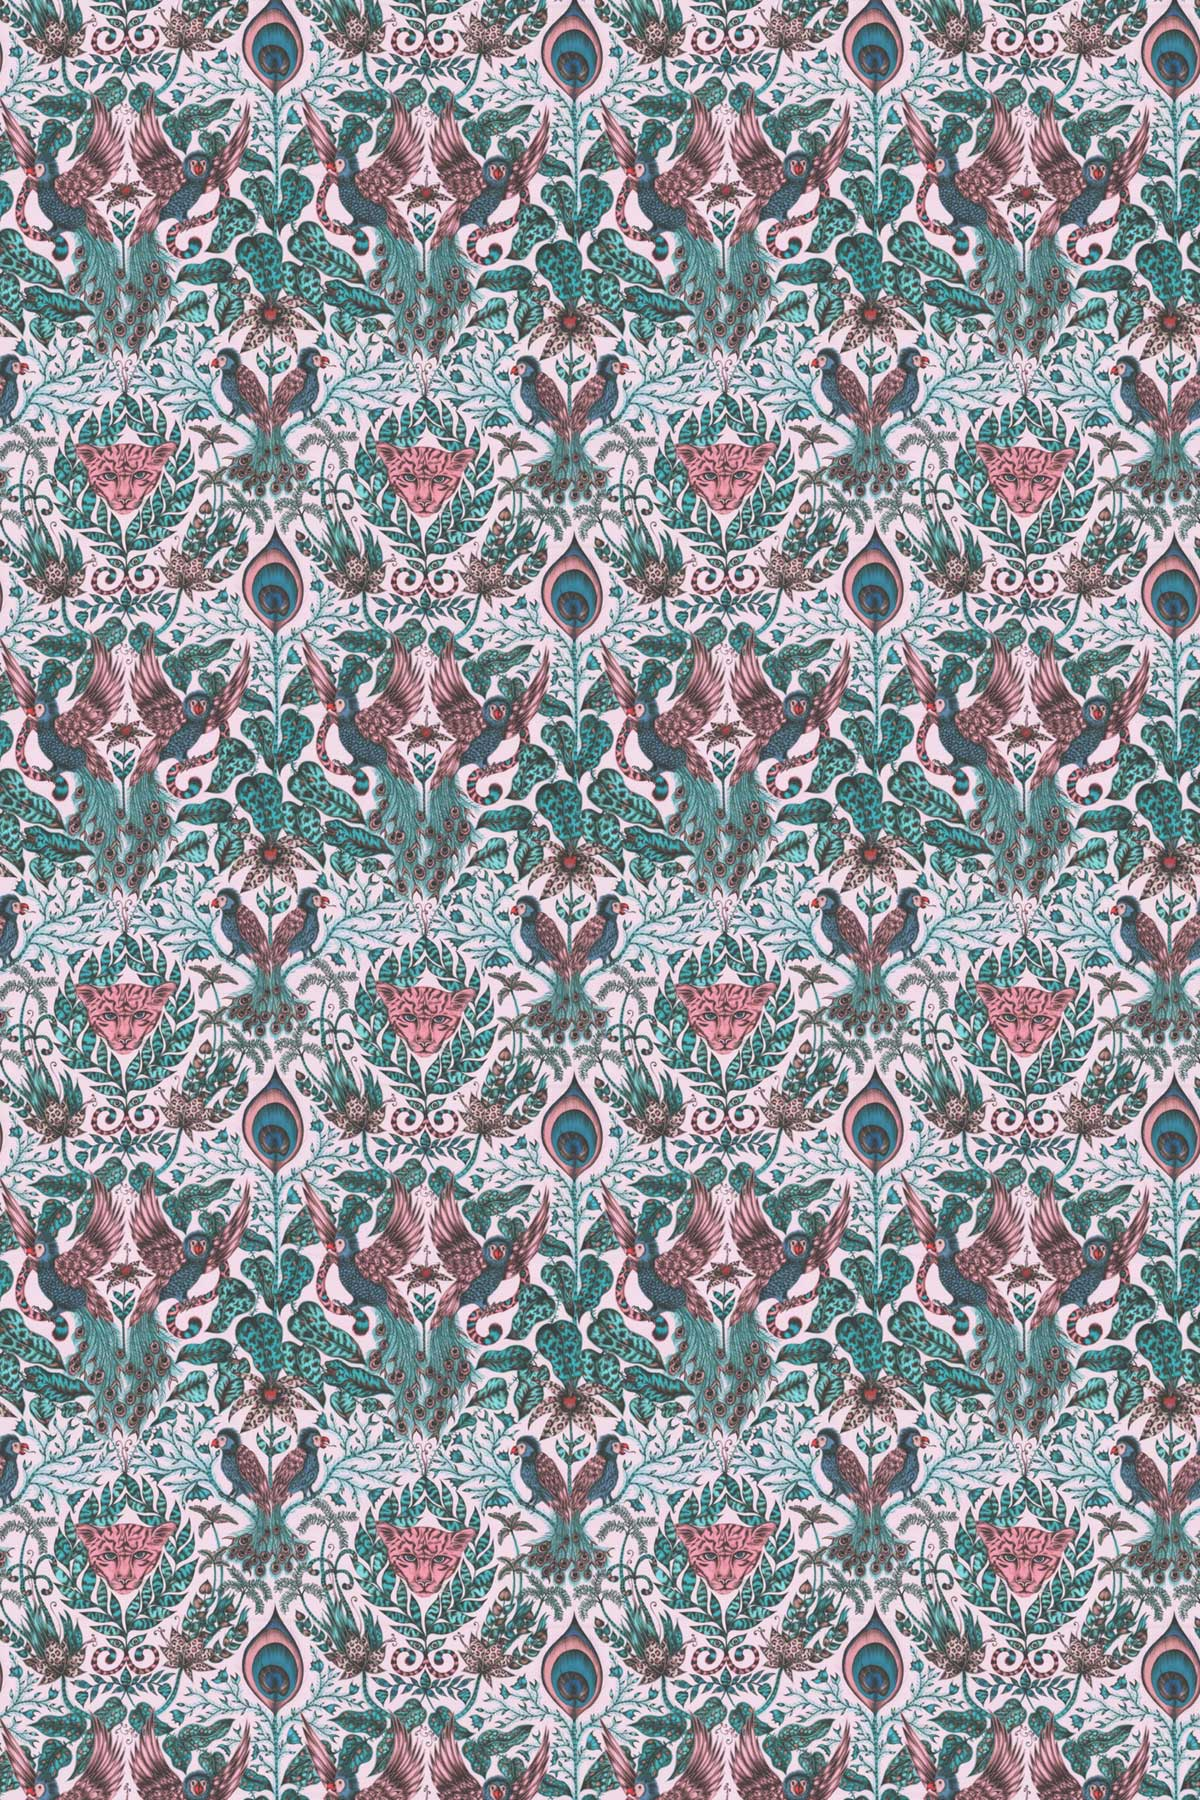 Emma J Shipley Amazon Pink Fabric - Product code: F1107/04